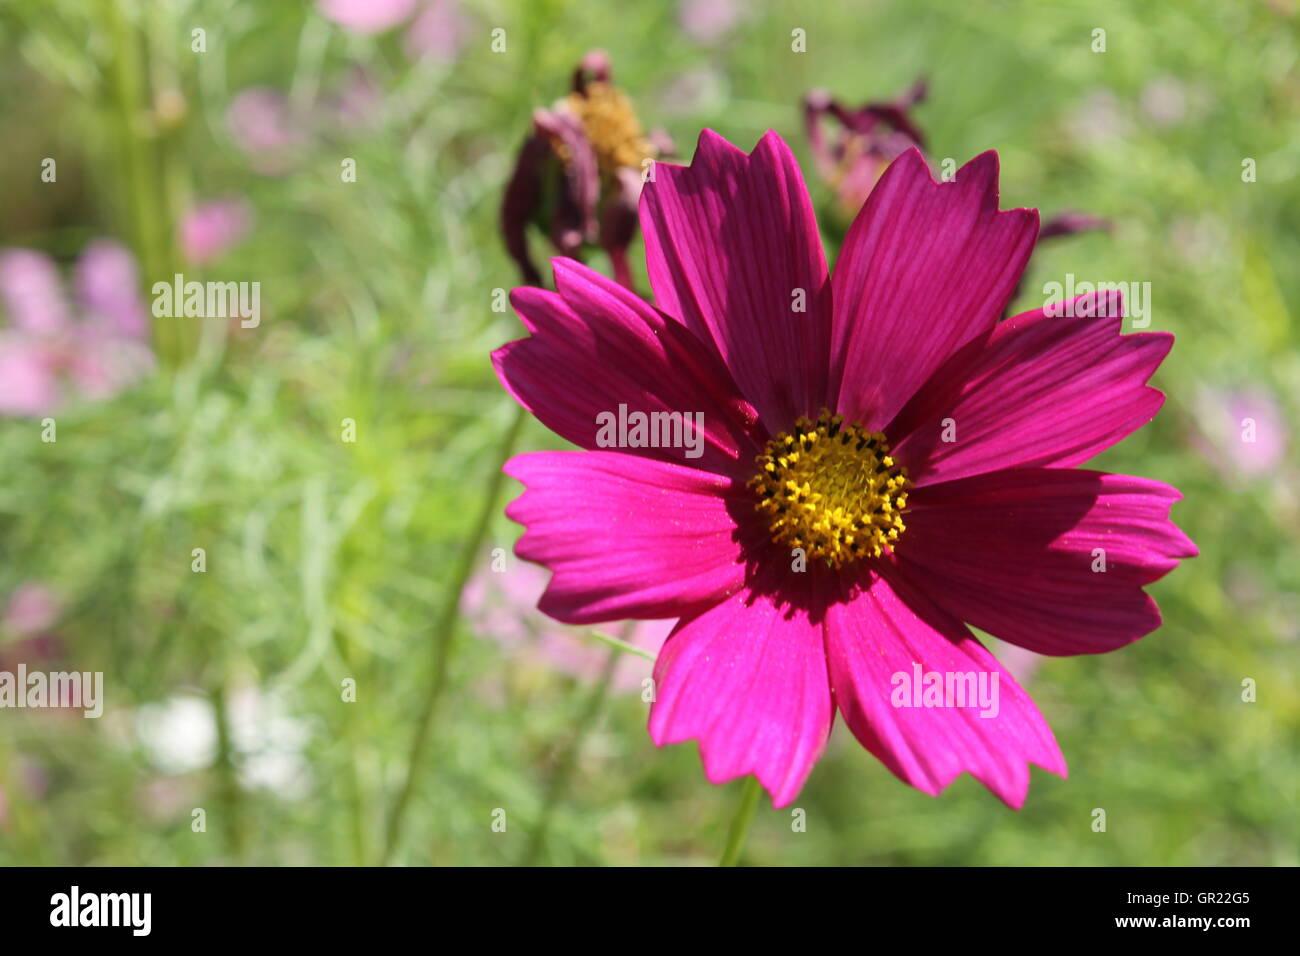 Closeup of a magenta flower in a prairie preserve - Stock Image